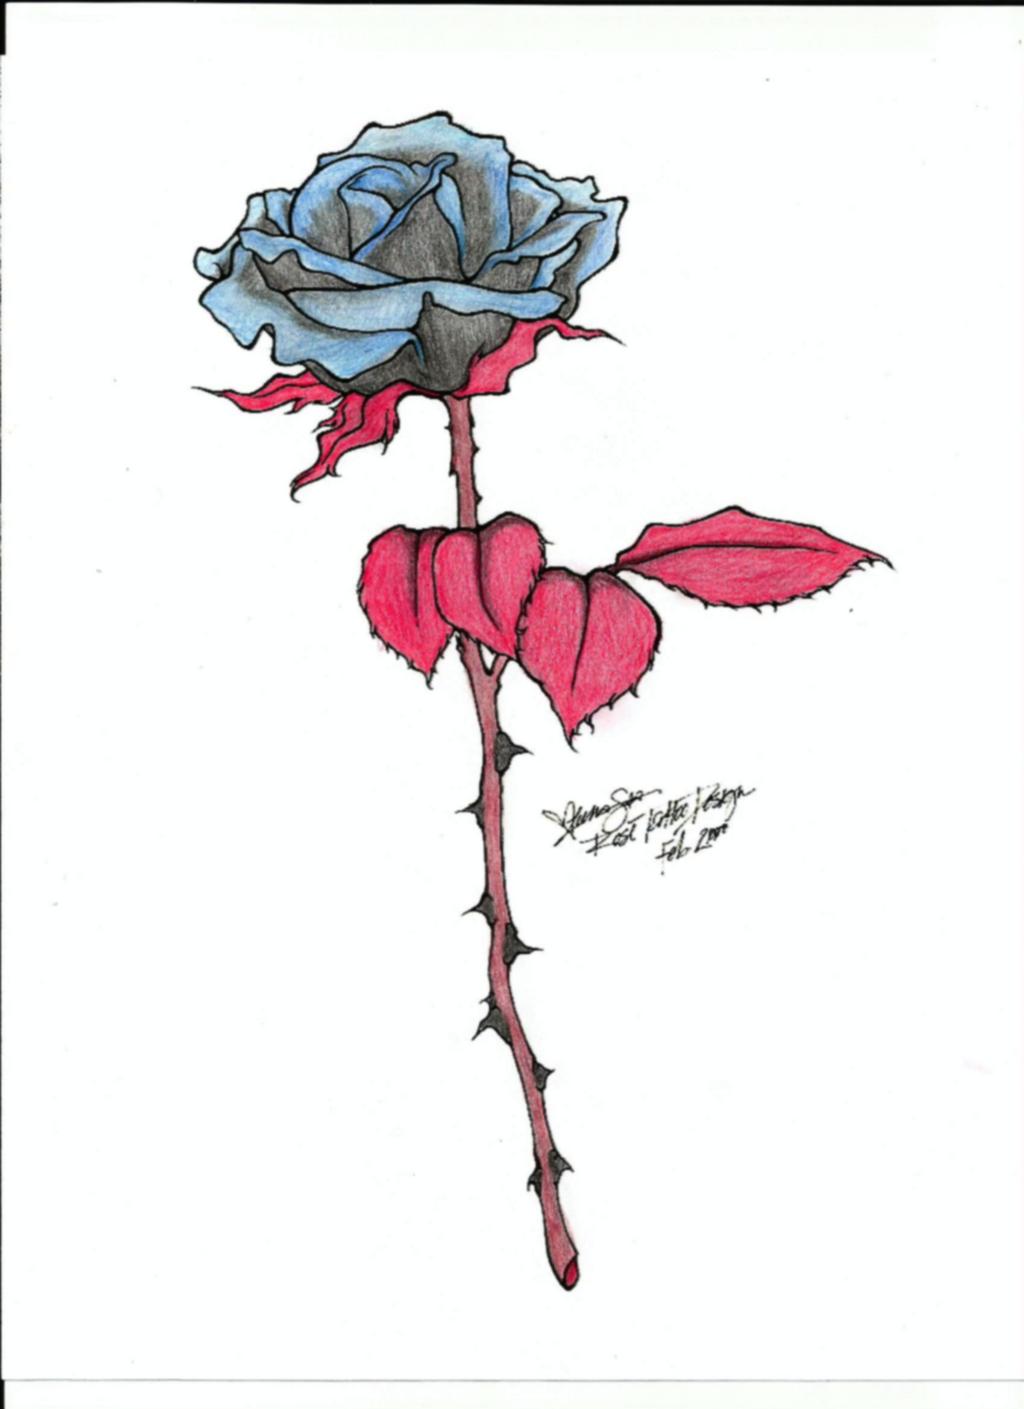 Line Art Rose Tattoo : Rose tattoo line art by midnightwolfchild on deviantart